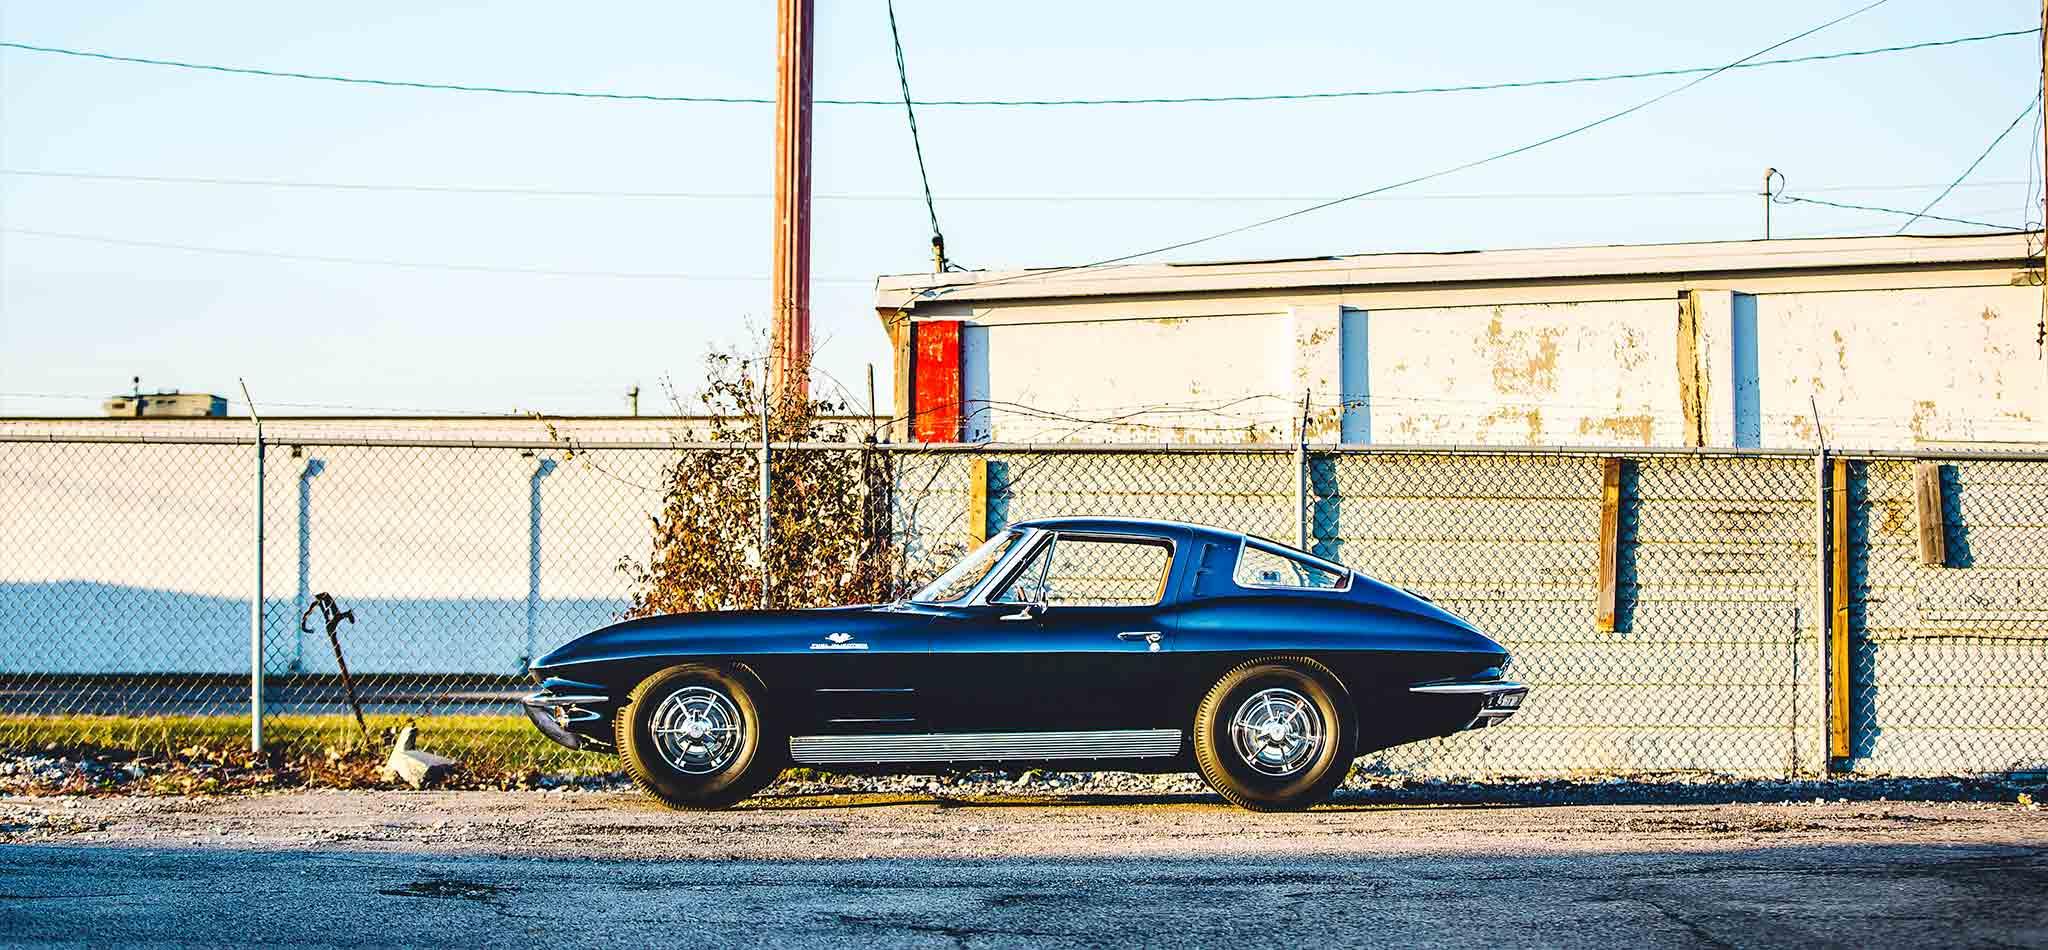 1963 Chevrolet Corvette Split Window Tedisgraphic Photo